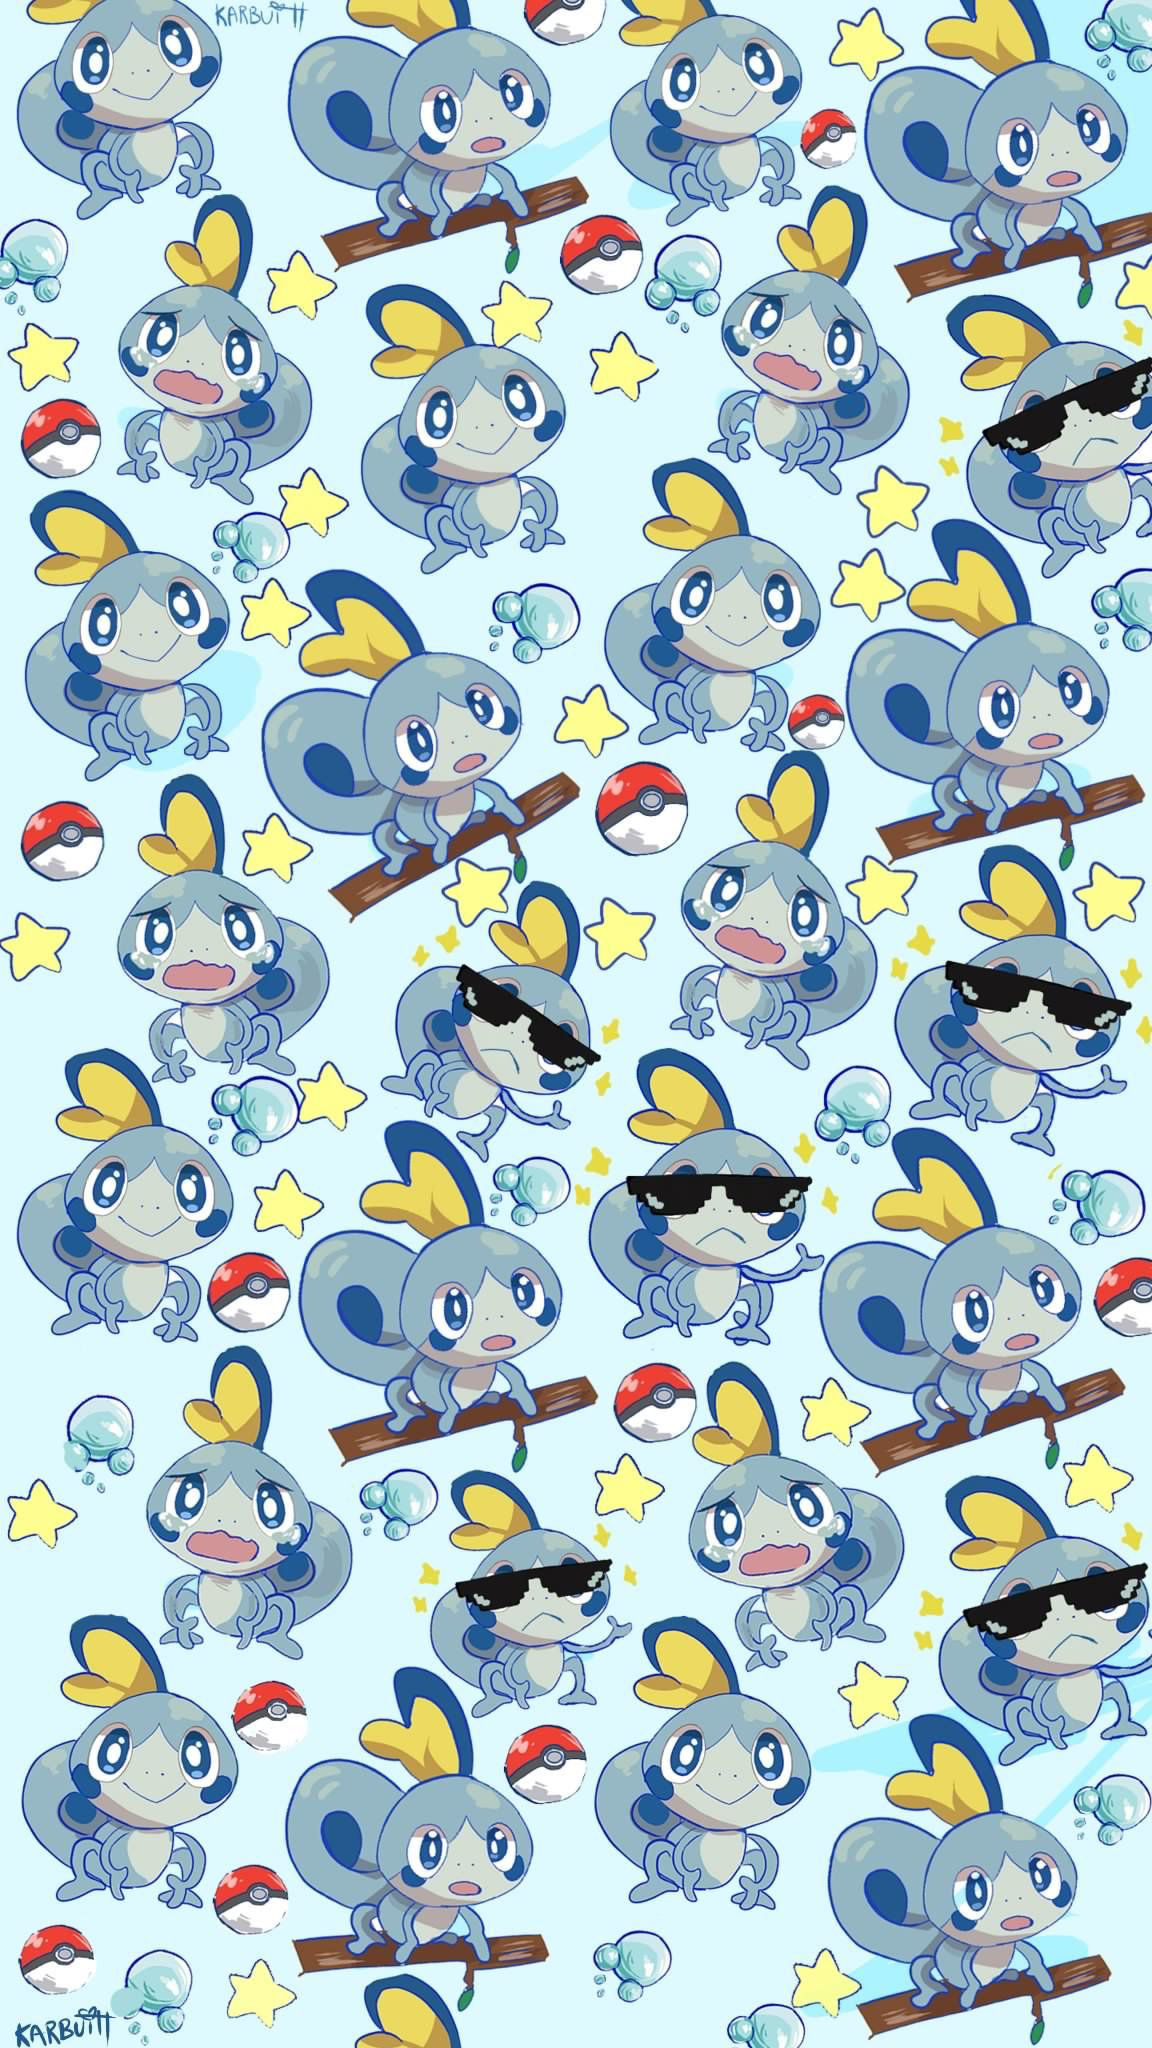 Pin By Tamaonvetta On Pokemon Pokemon Pokemon Backgrounds Cool Pokemon Wallpapers